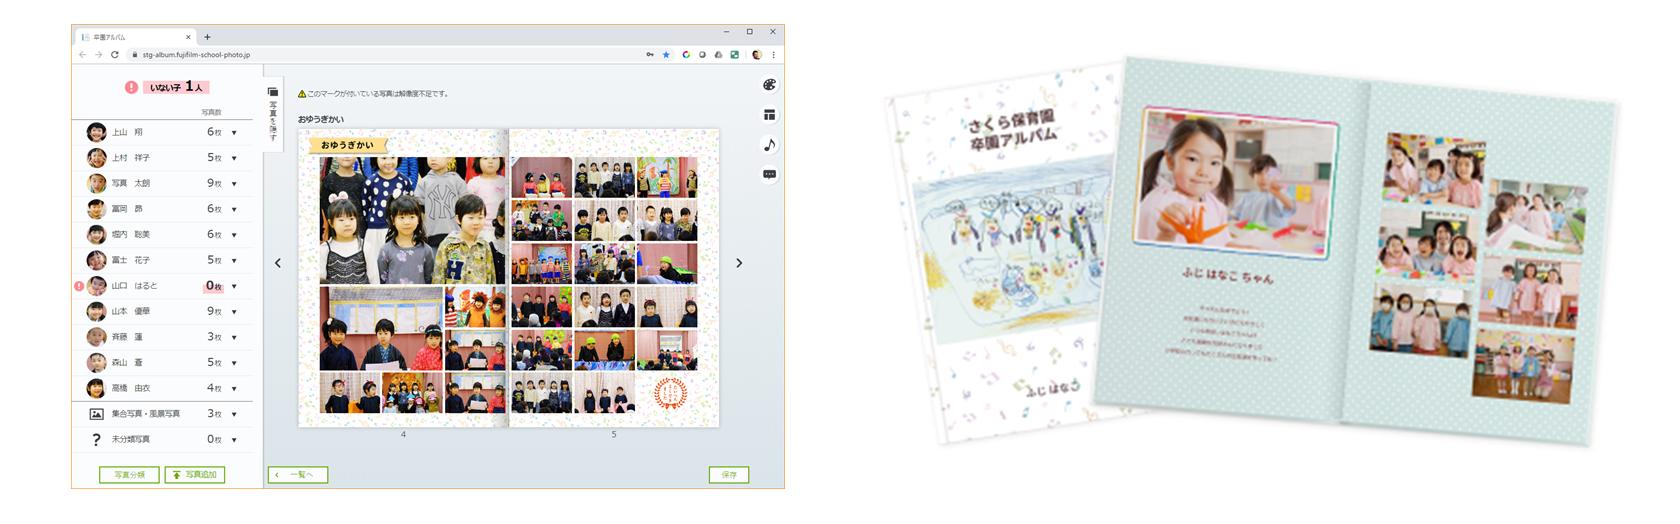 "[image]3) On-line albums ordering service ""FUJIFILM School Photo, Graduation Album Editor"""